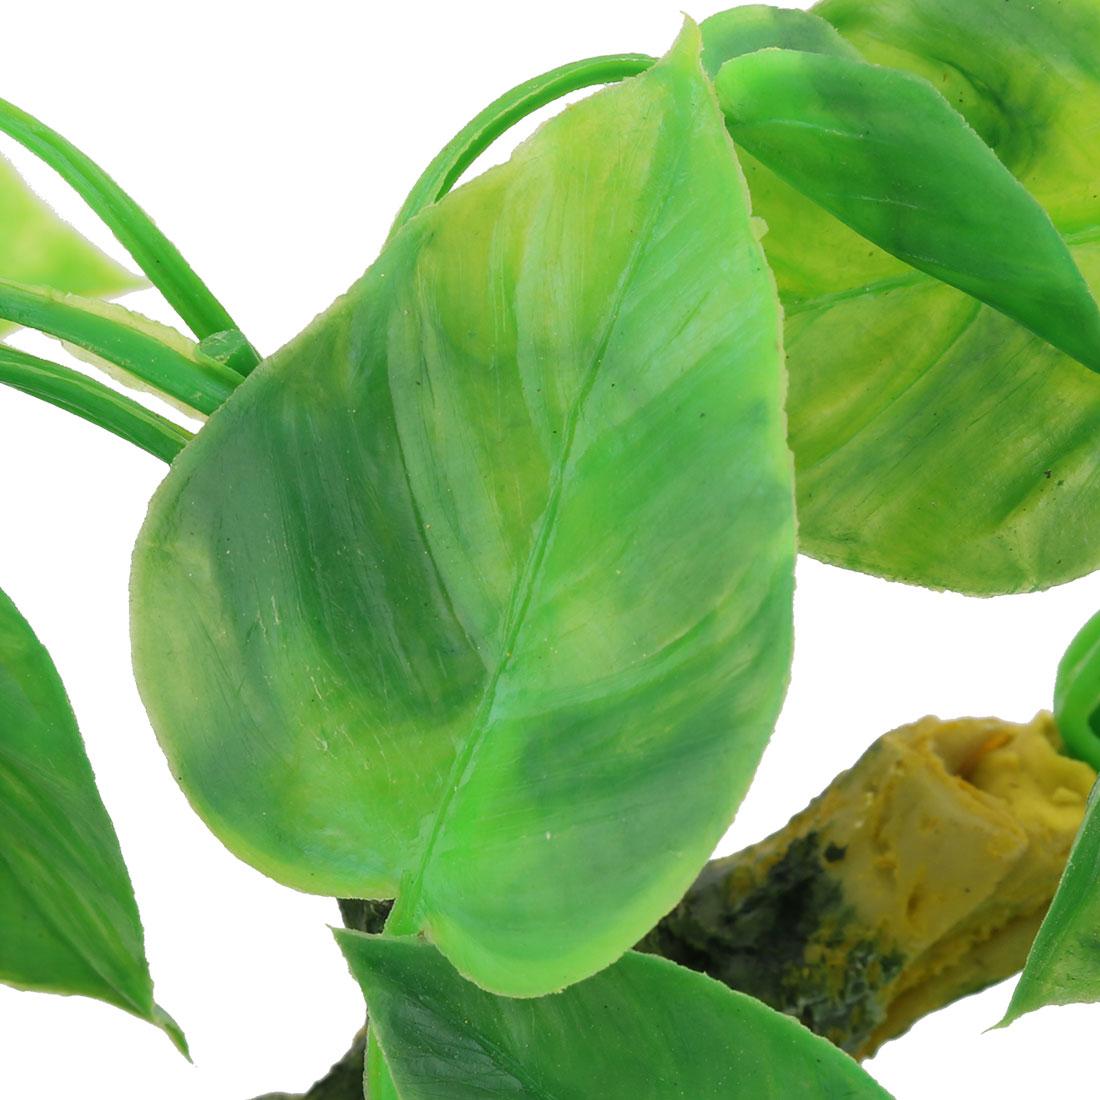 Aquarium Ceramic Base Plastic Artificial Landscap Water Plant Decor Green Yellow - image 1 de 3